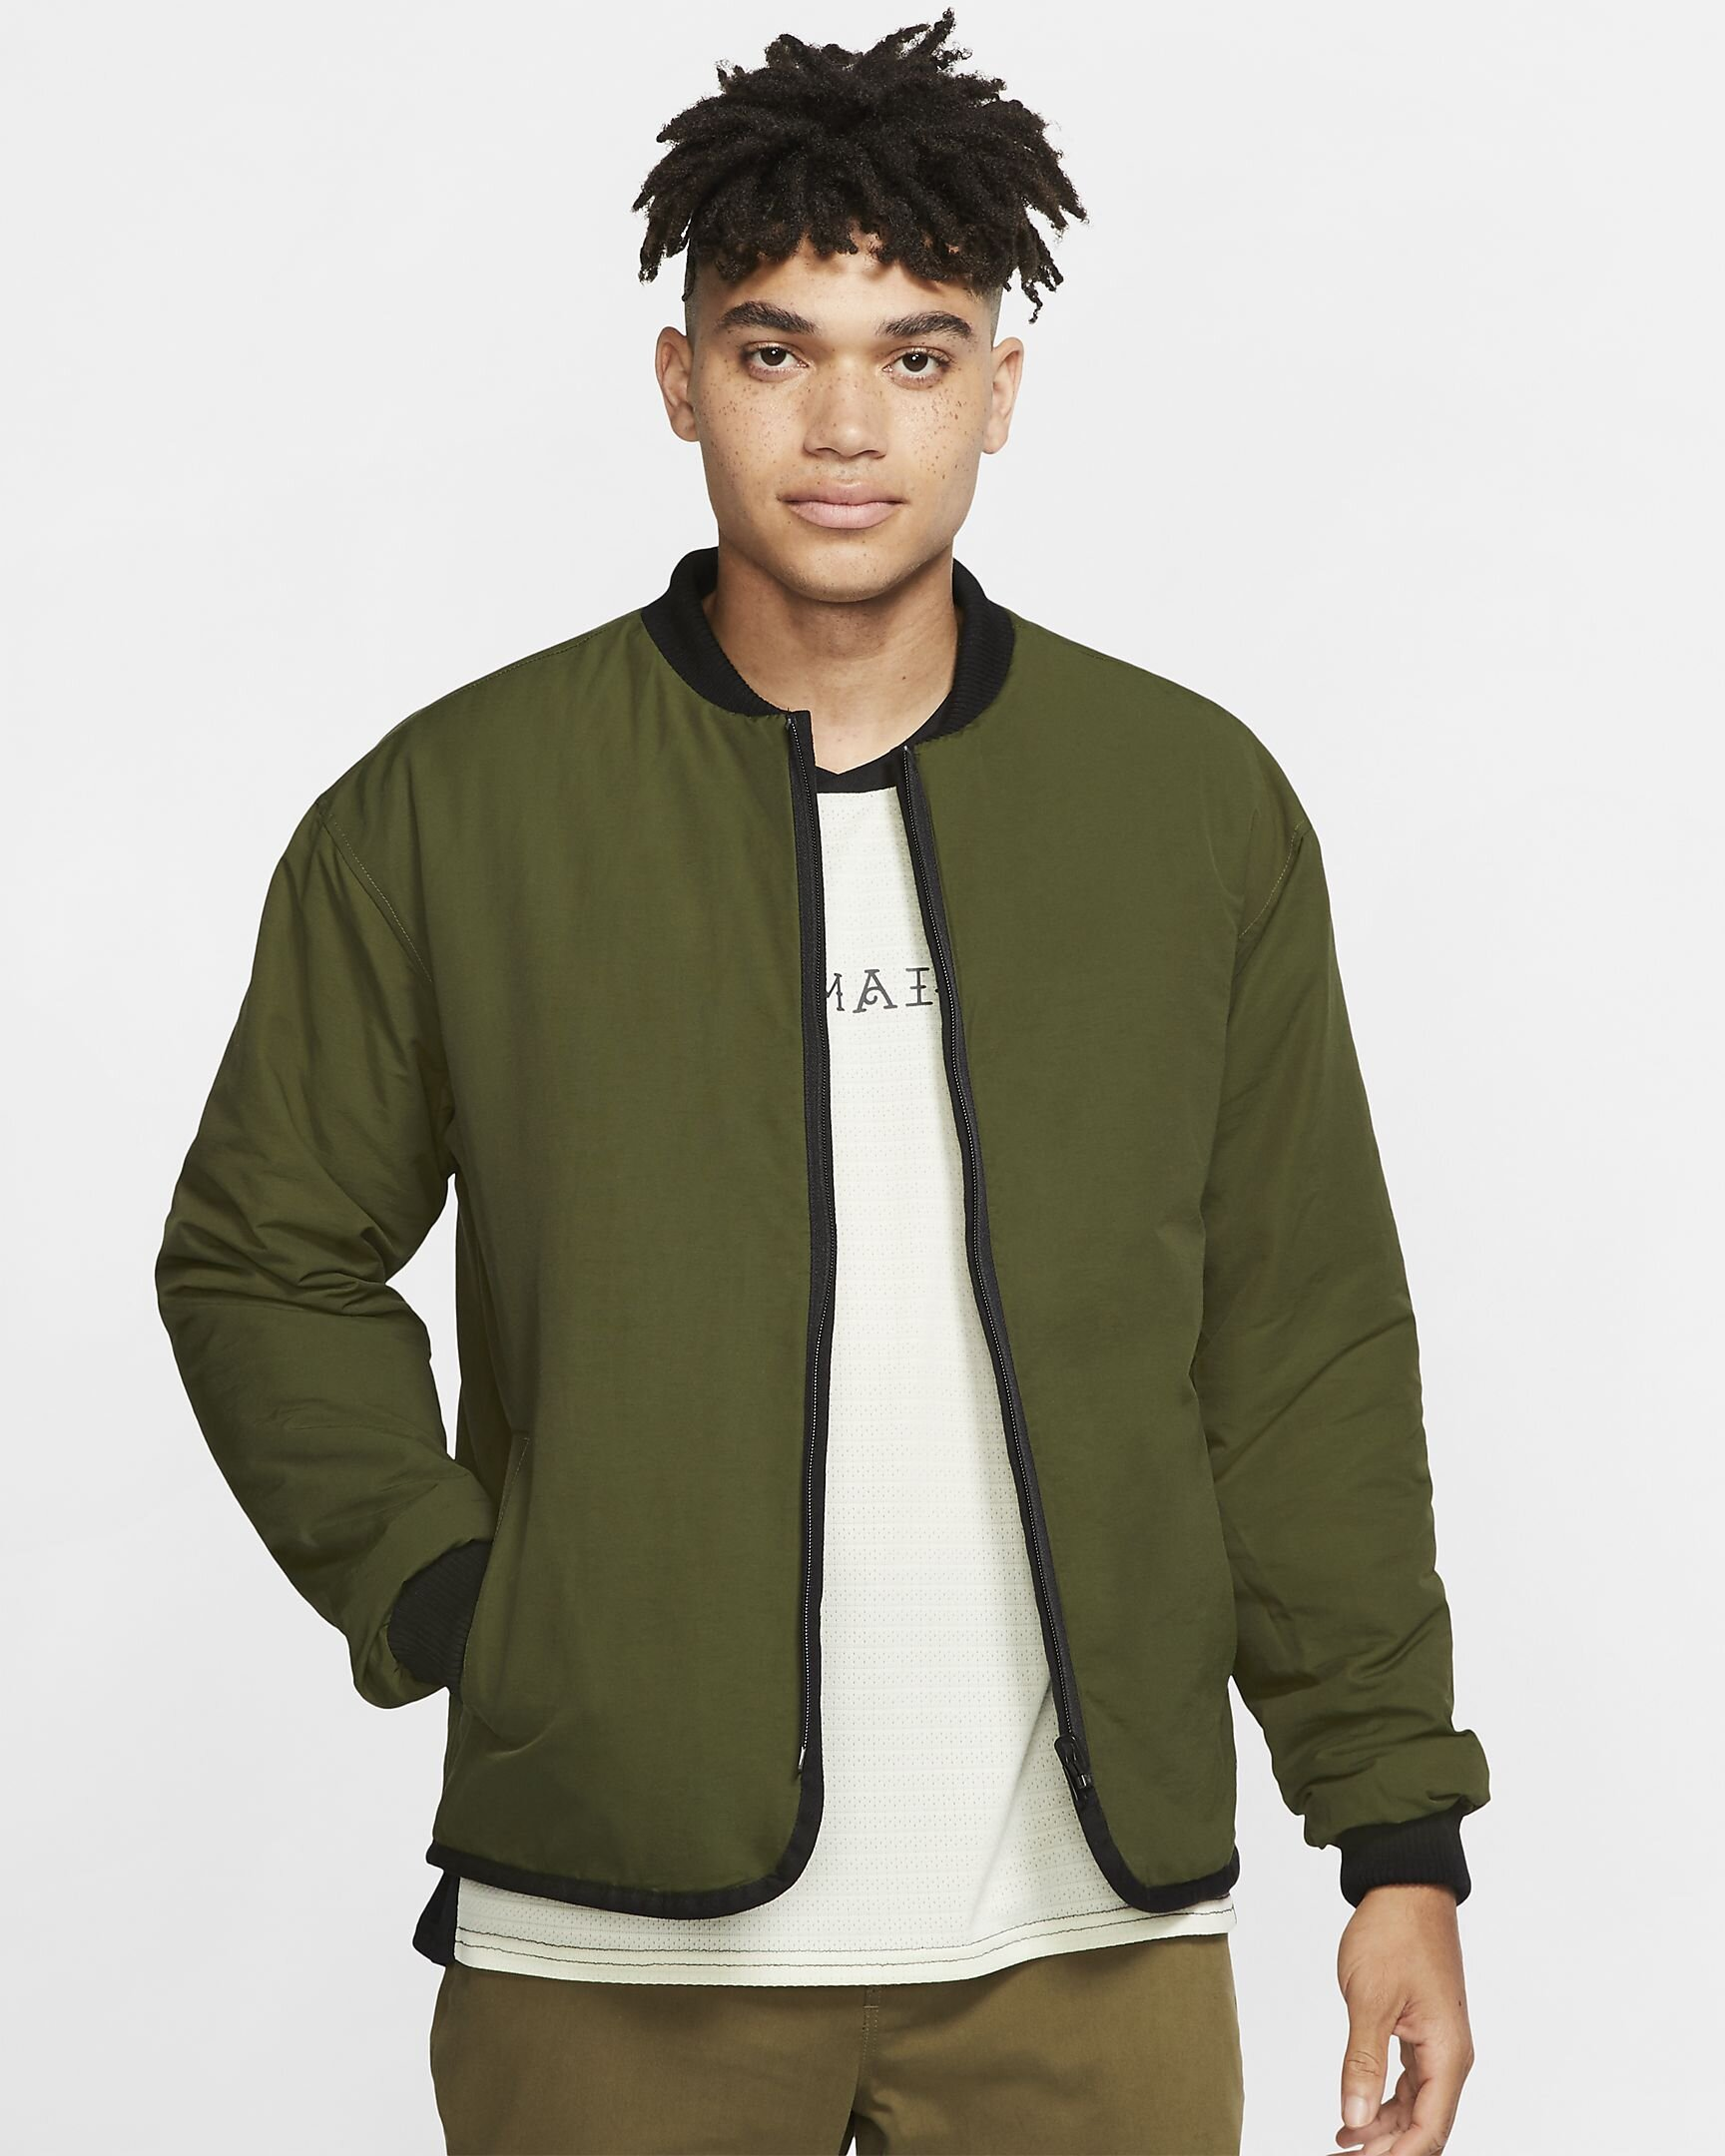 hurley-jamaica-mens-jacket-w4c3W4-1.jpg